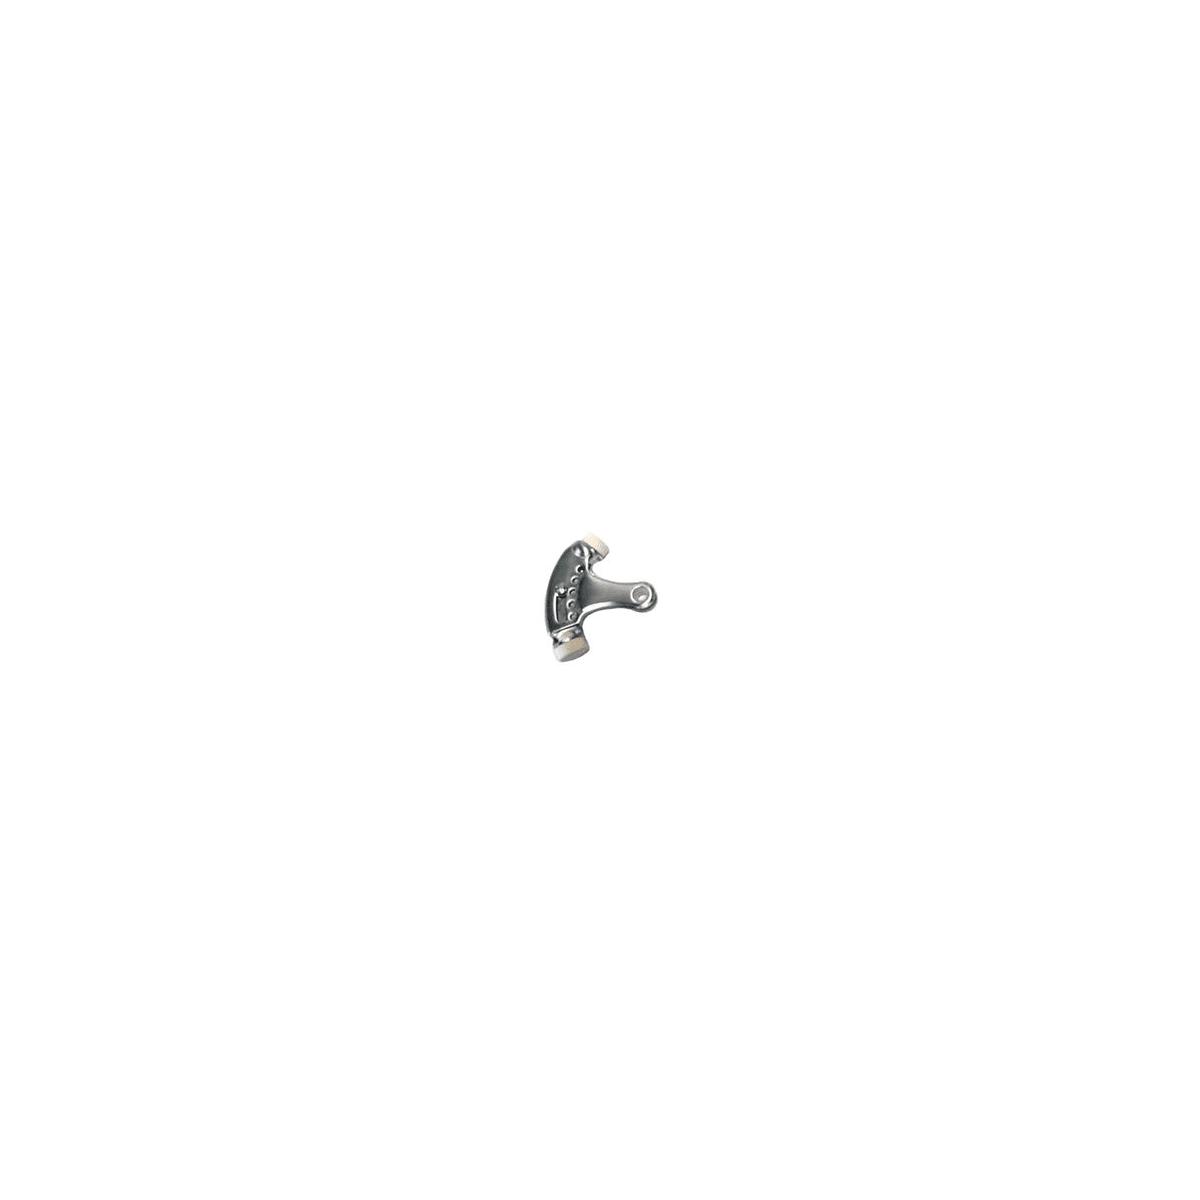 Ives by Schlage 69F3 Hinge Pin Door Stop